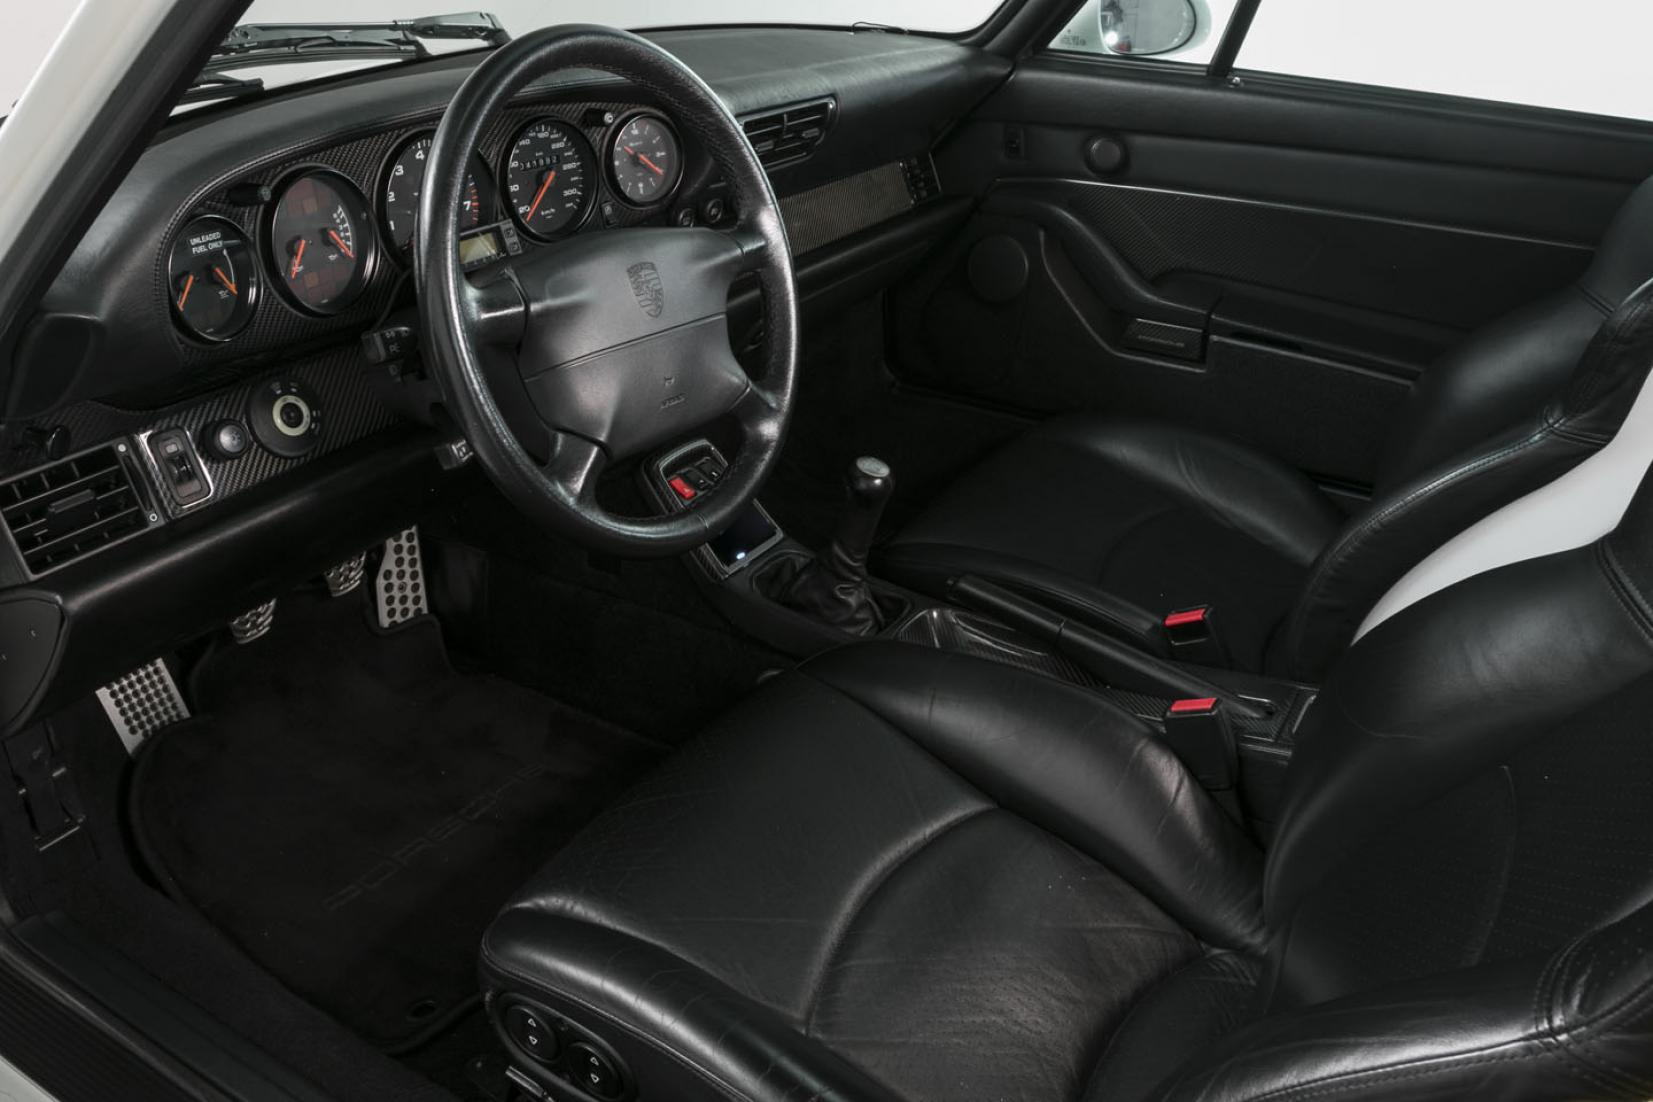 Interieur Porsche 911 Turbo 993 1995